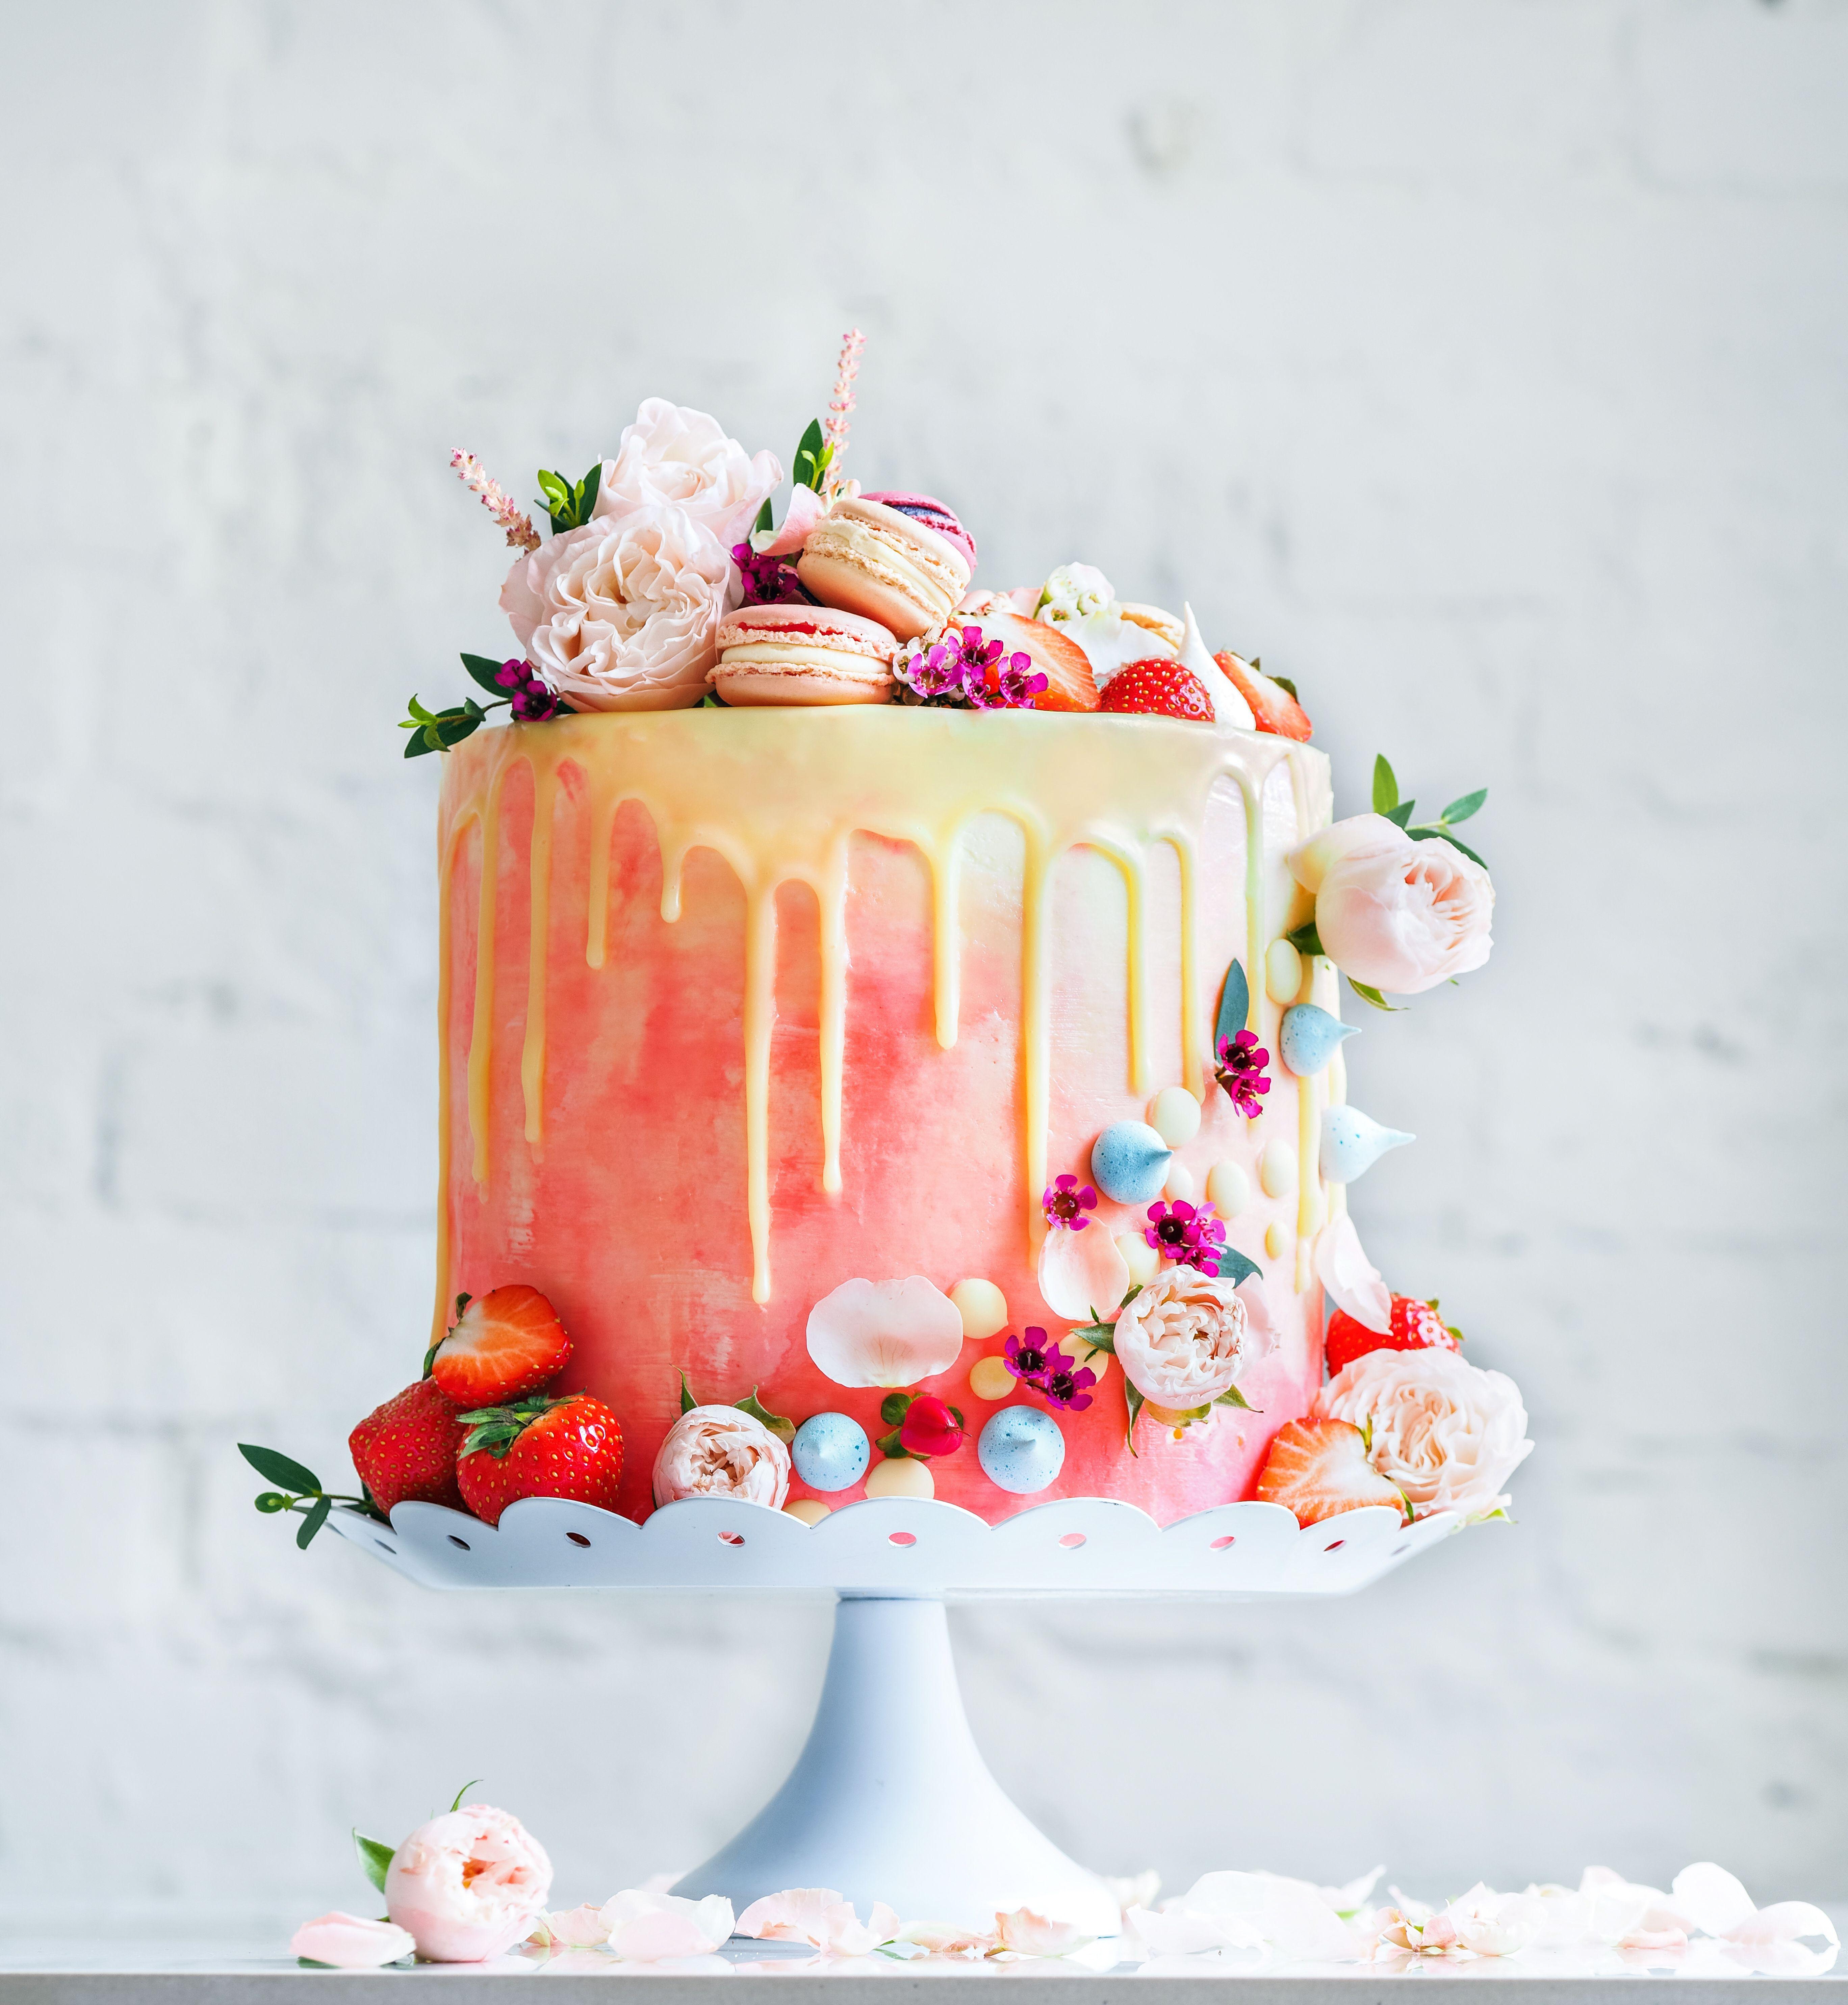 Wedding Cake Recipe Custom History: International Wedding Cake Trends For 2019